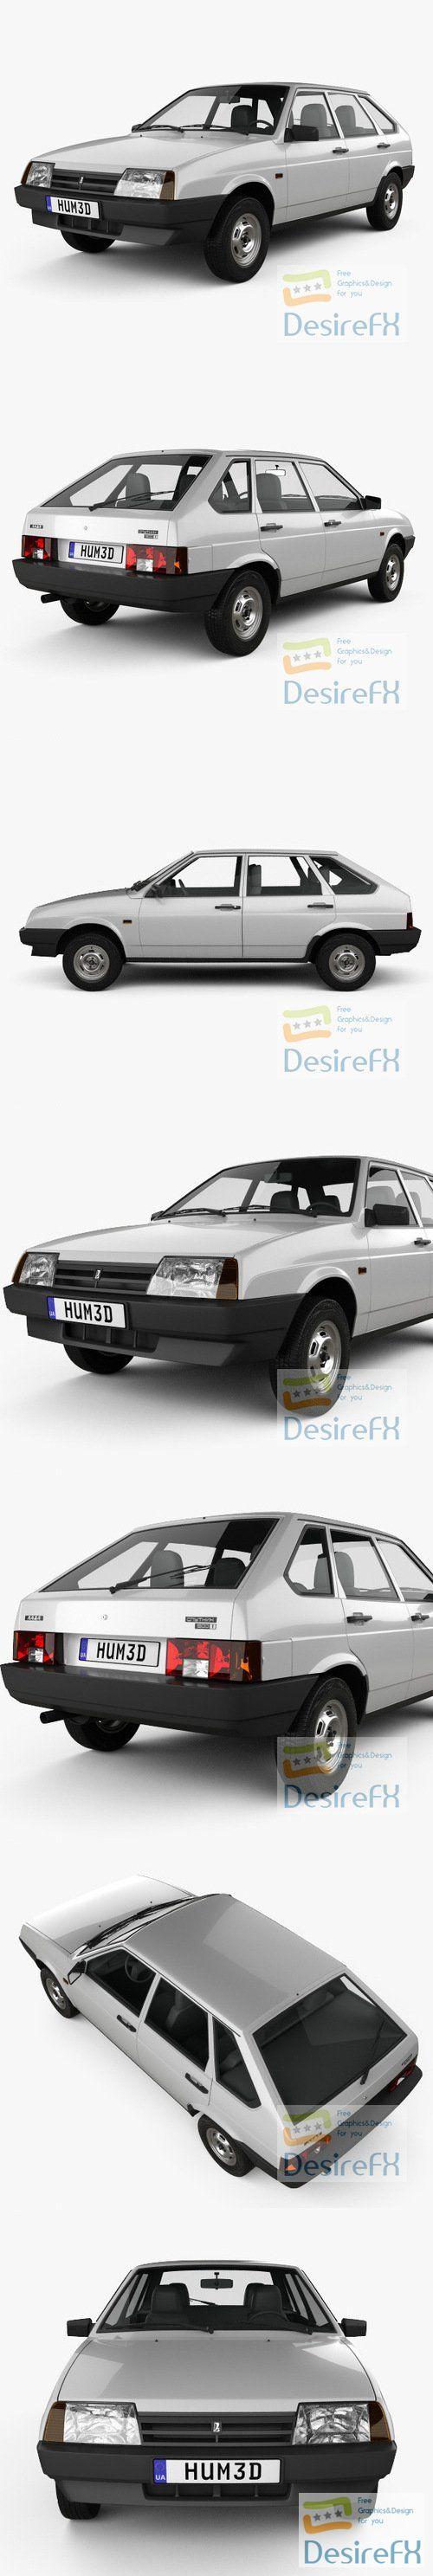 VAZ Lada 2109 1987 3D Model